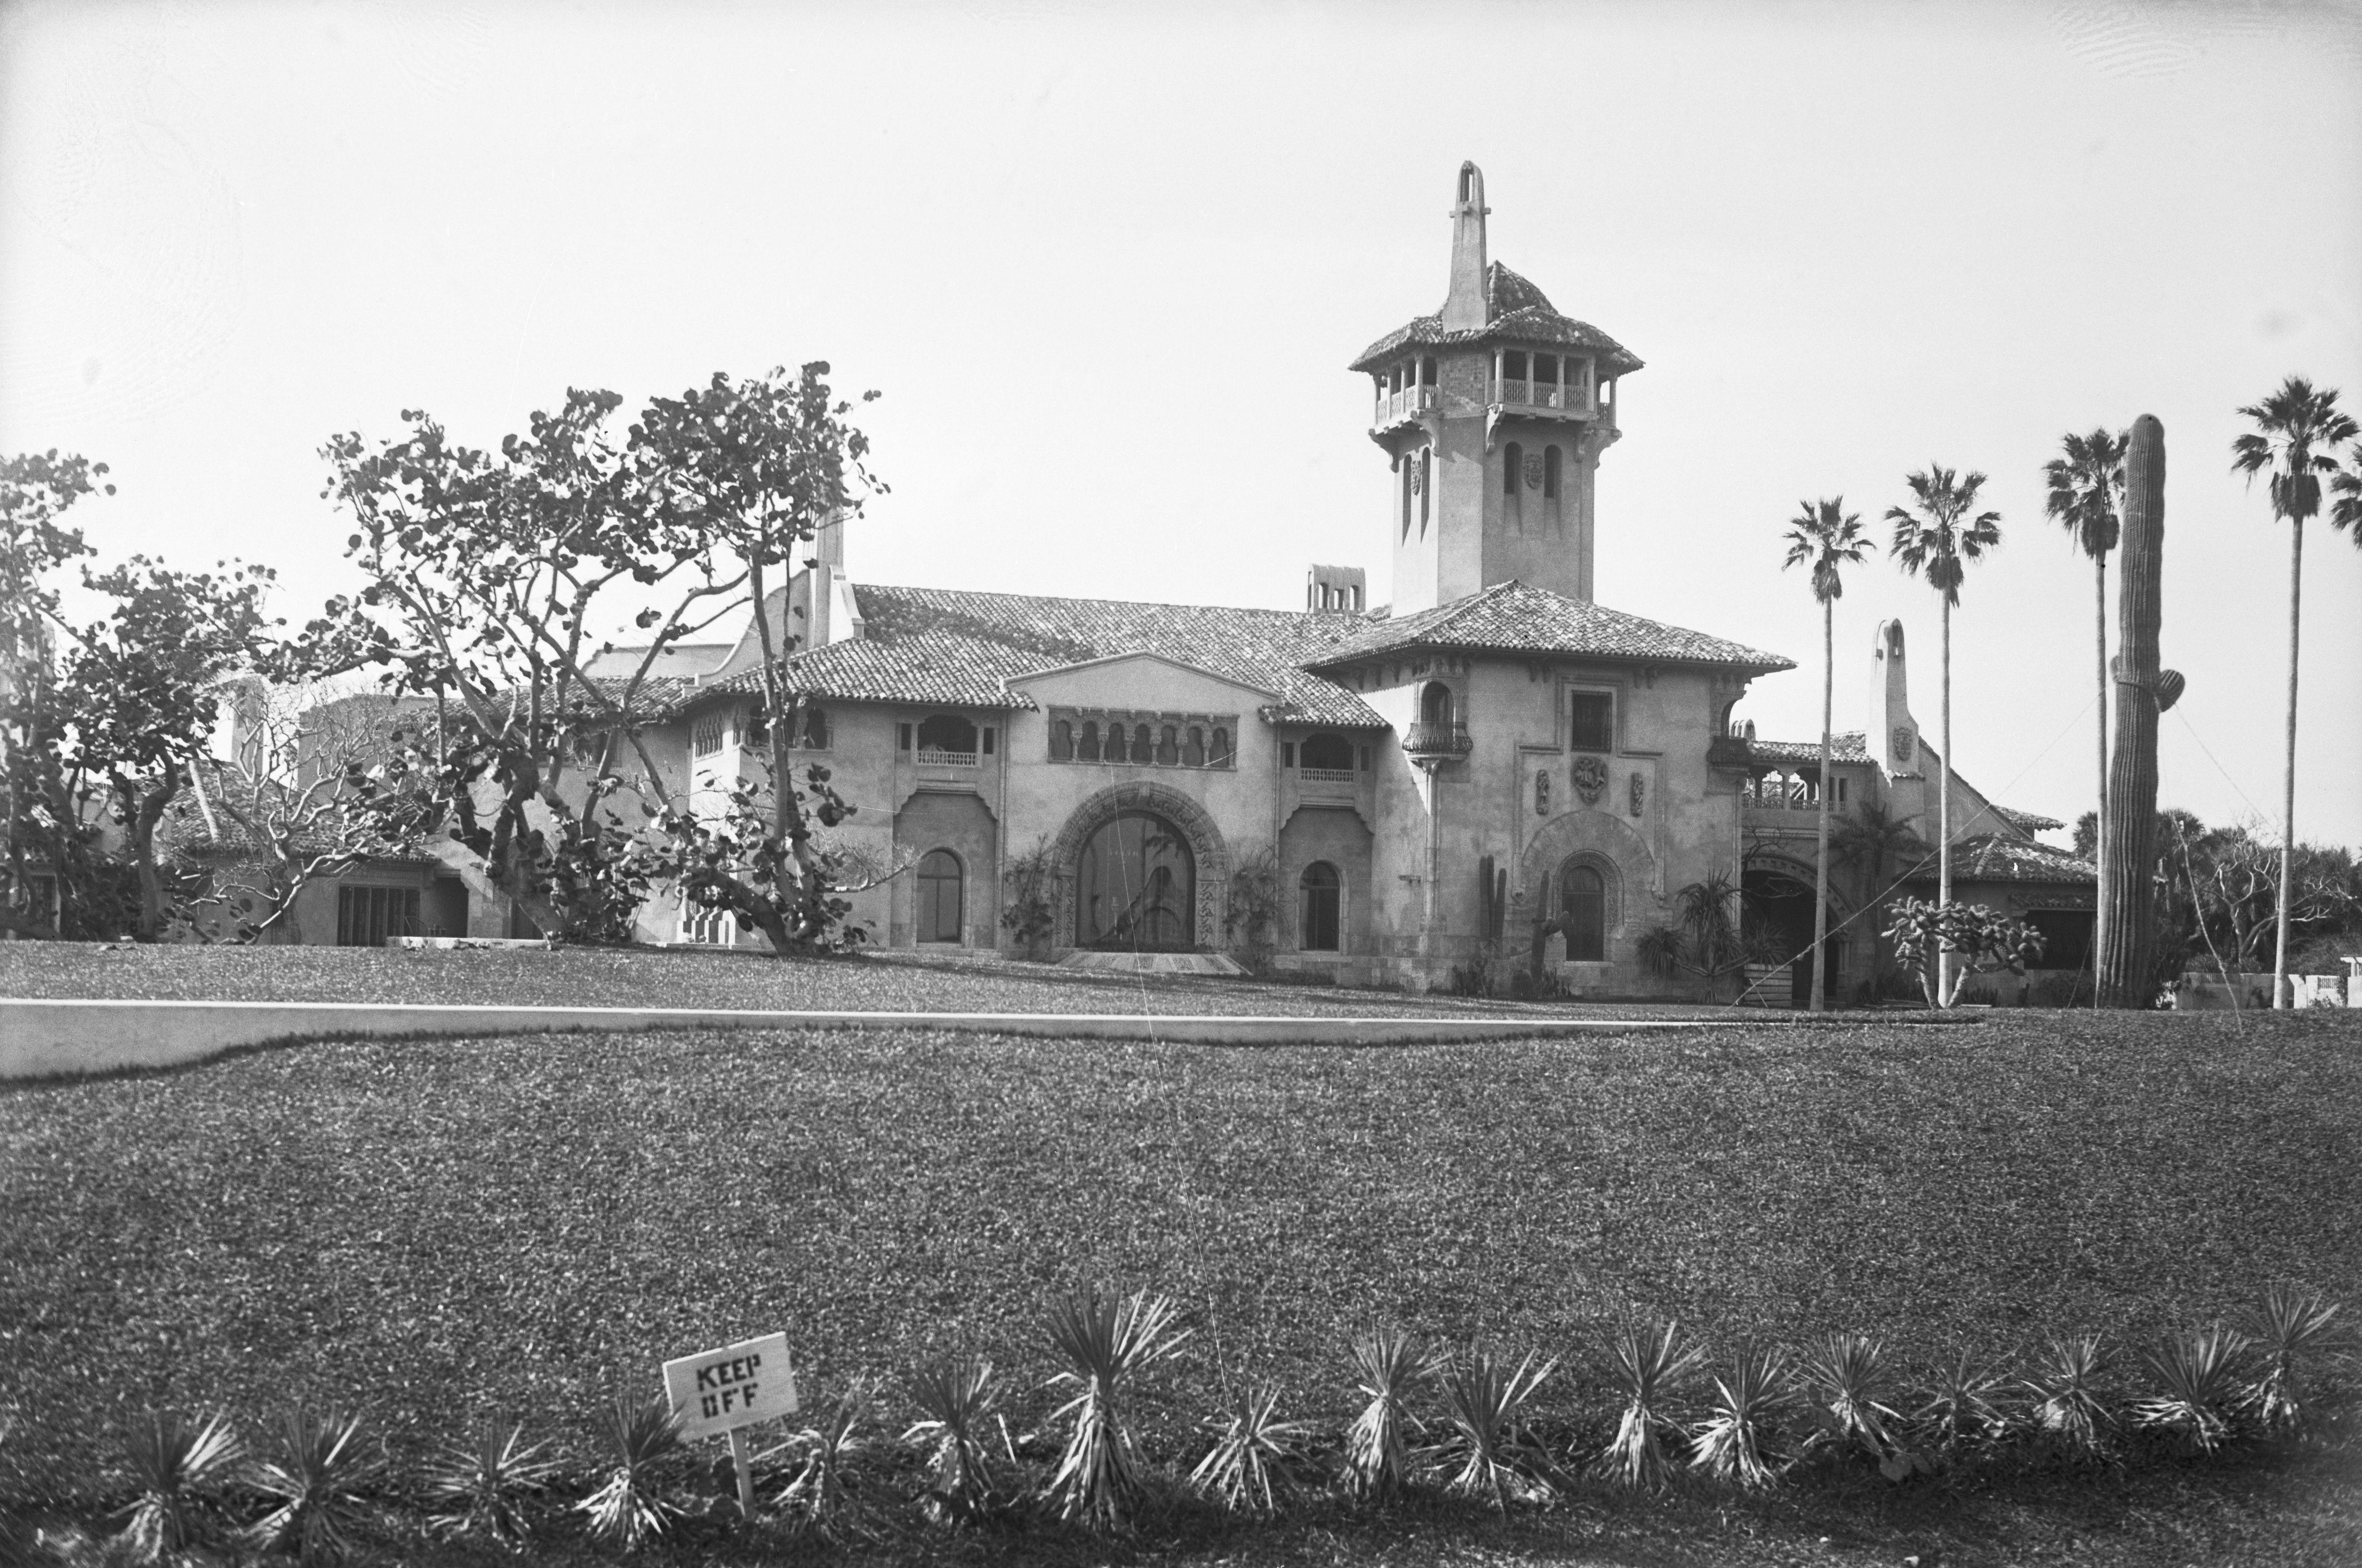 Mar-a-Lago in 1928